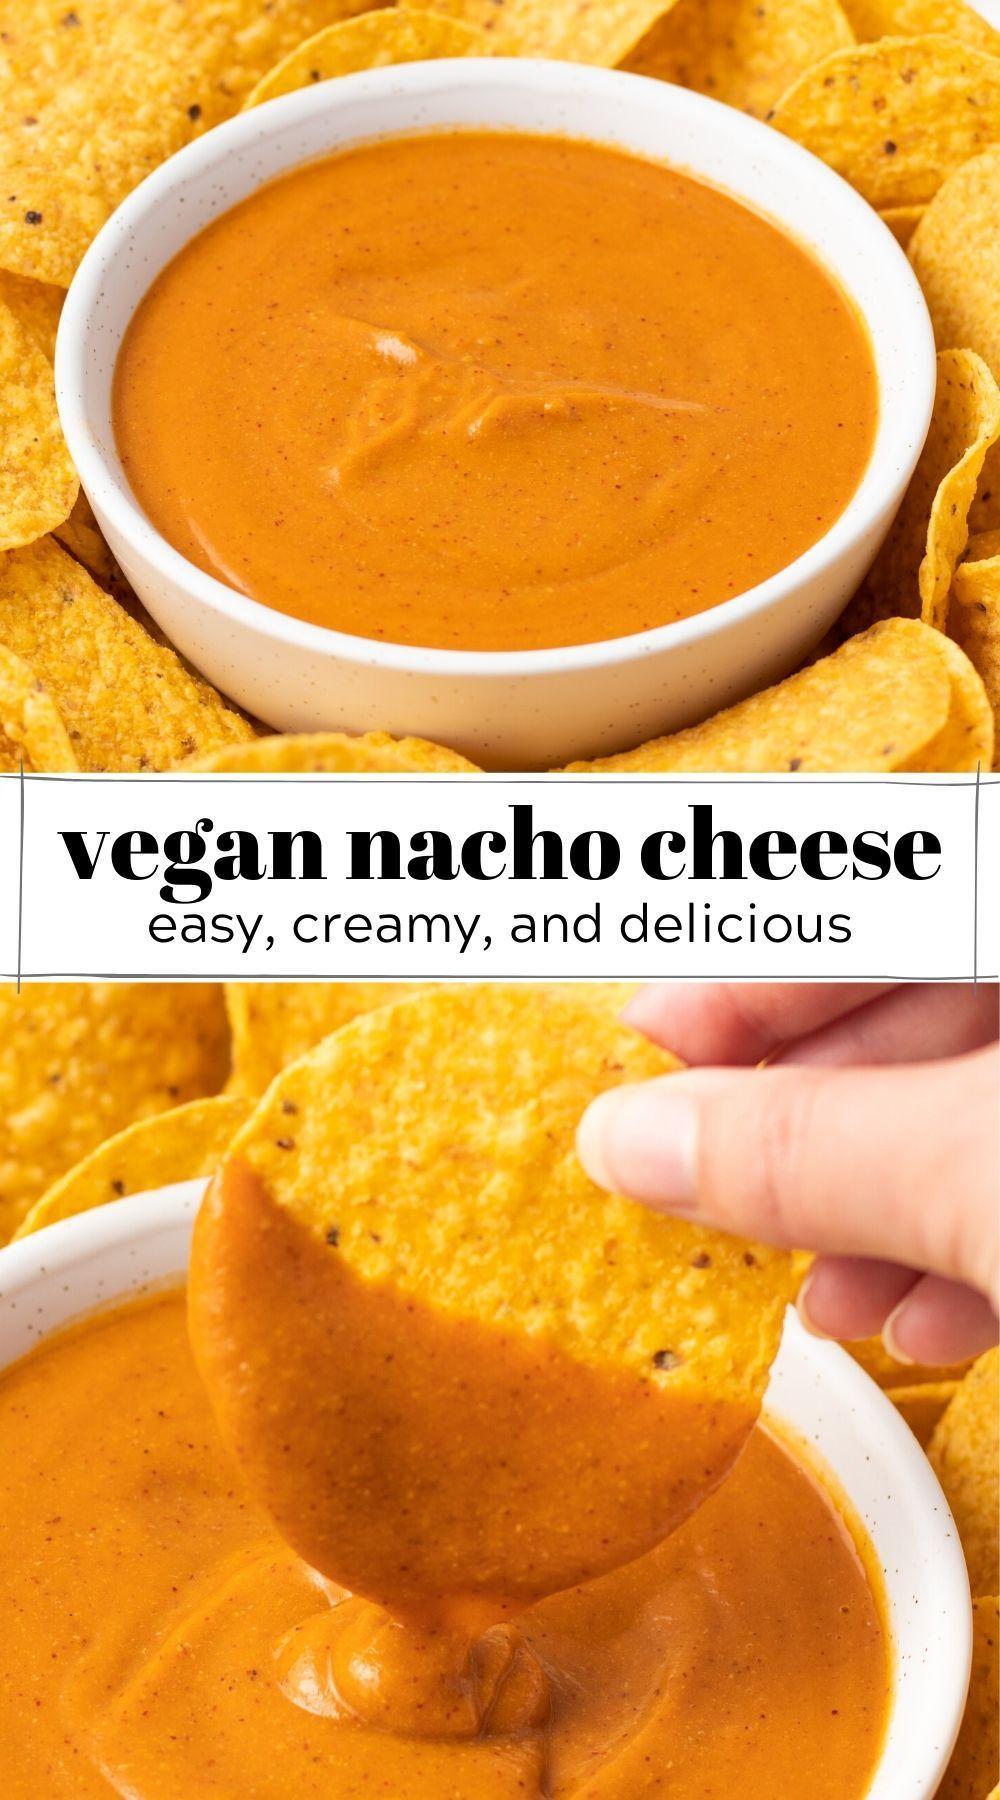 Guilt Free Vegan Nacho Cheese Recipe In 2020 Oil Free Vegan Recipes Vegan Nachos Cheese Recipes